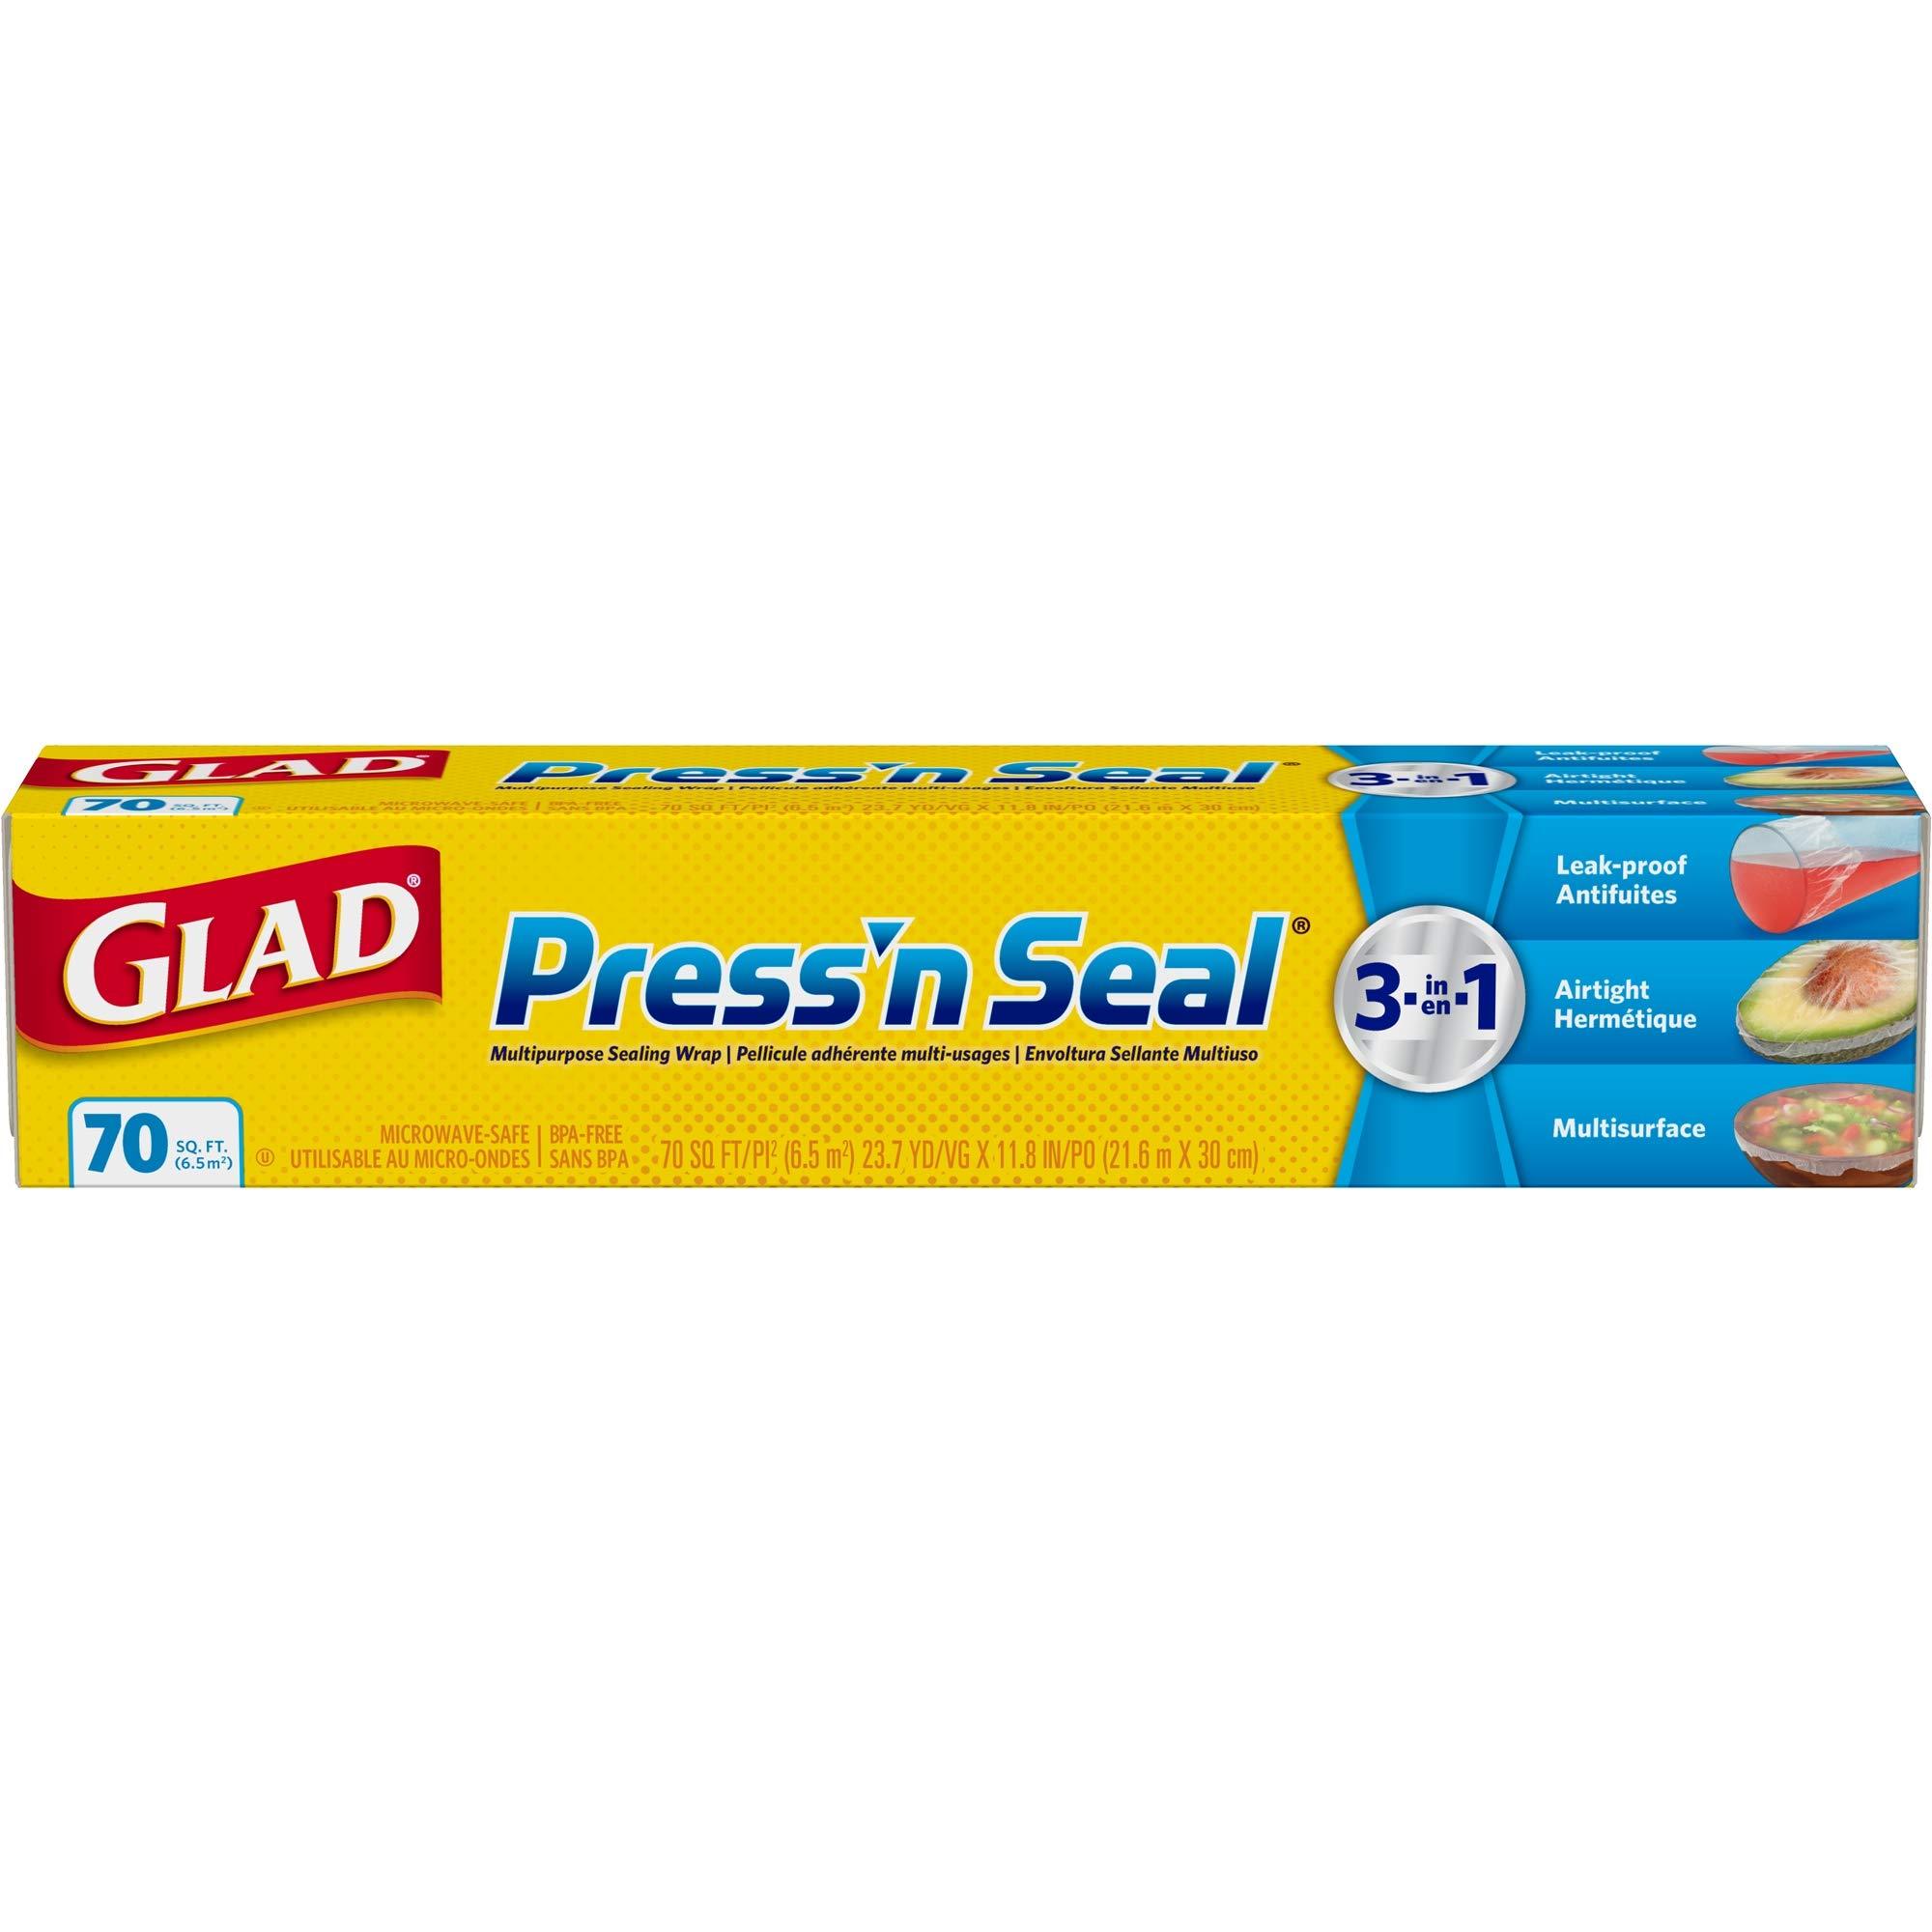 Glad Press'n Seal Food Plastic Wrap - 70 Square Foot Roll, 12 Rolls/Case (70441) by Glad